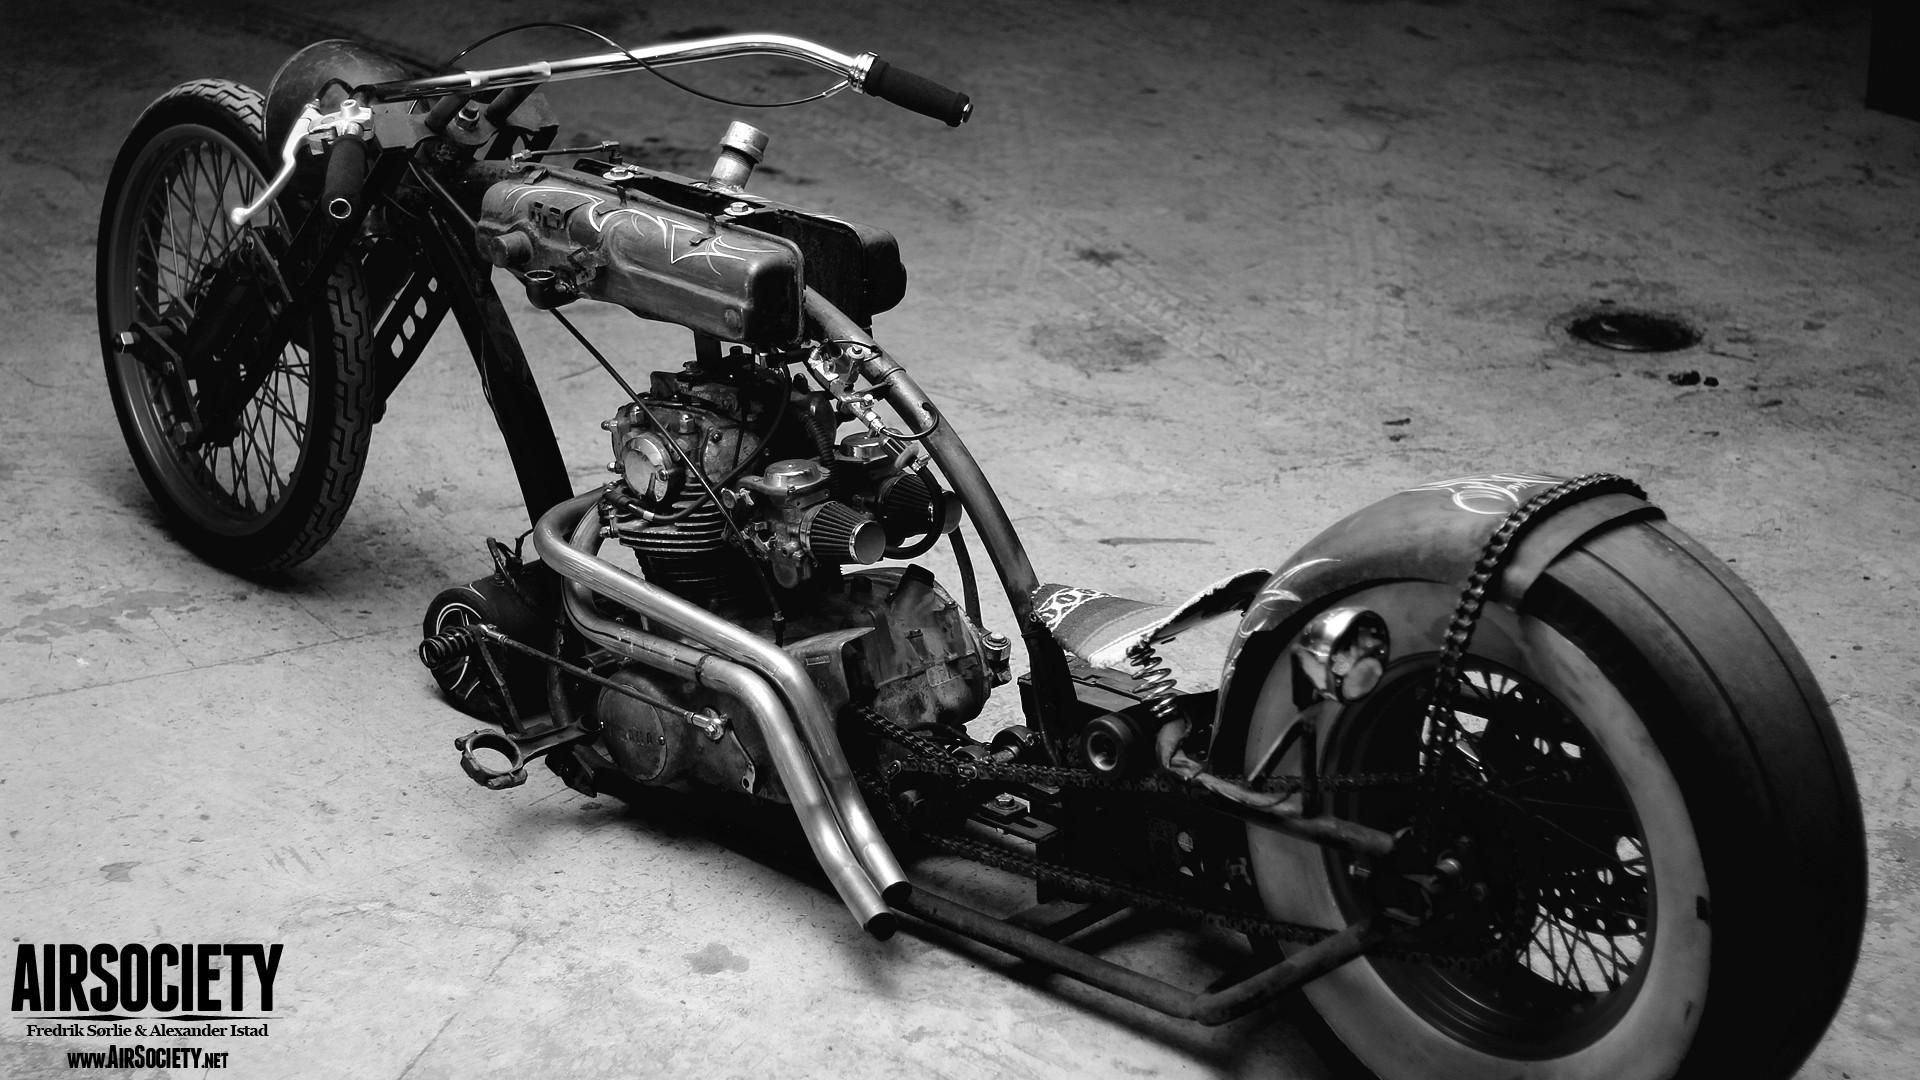 black and white bike engines chopper grayscale ride Yamaha 1920x1080